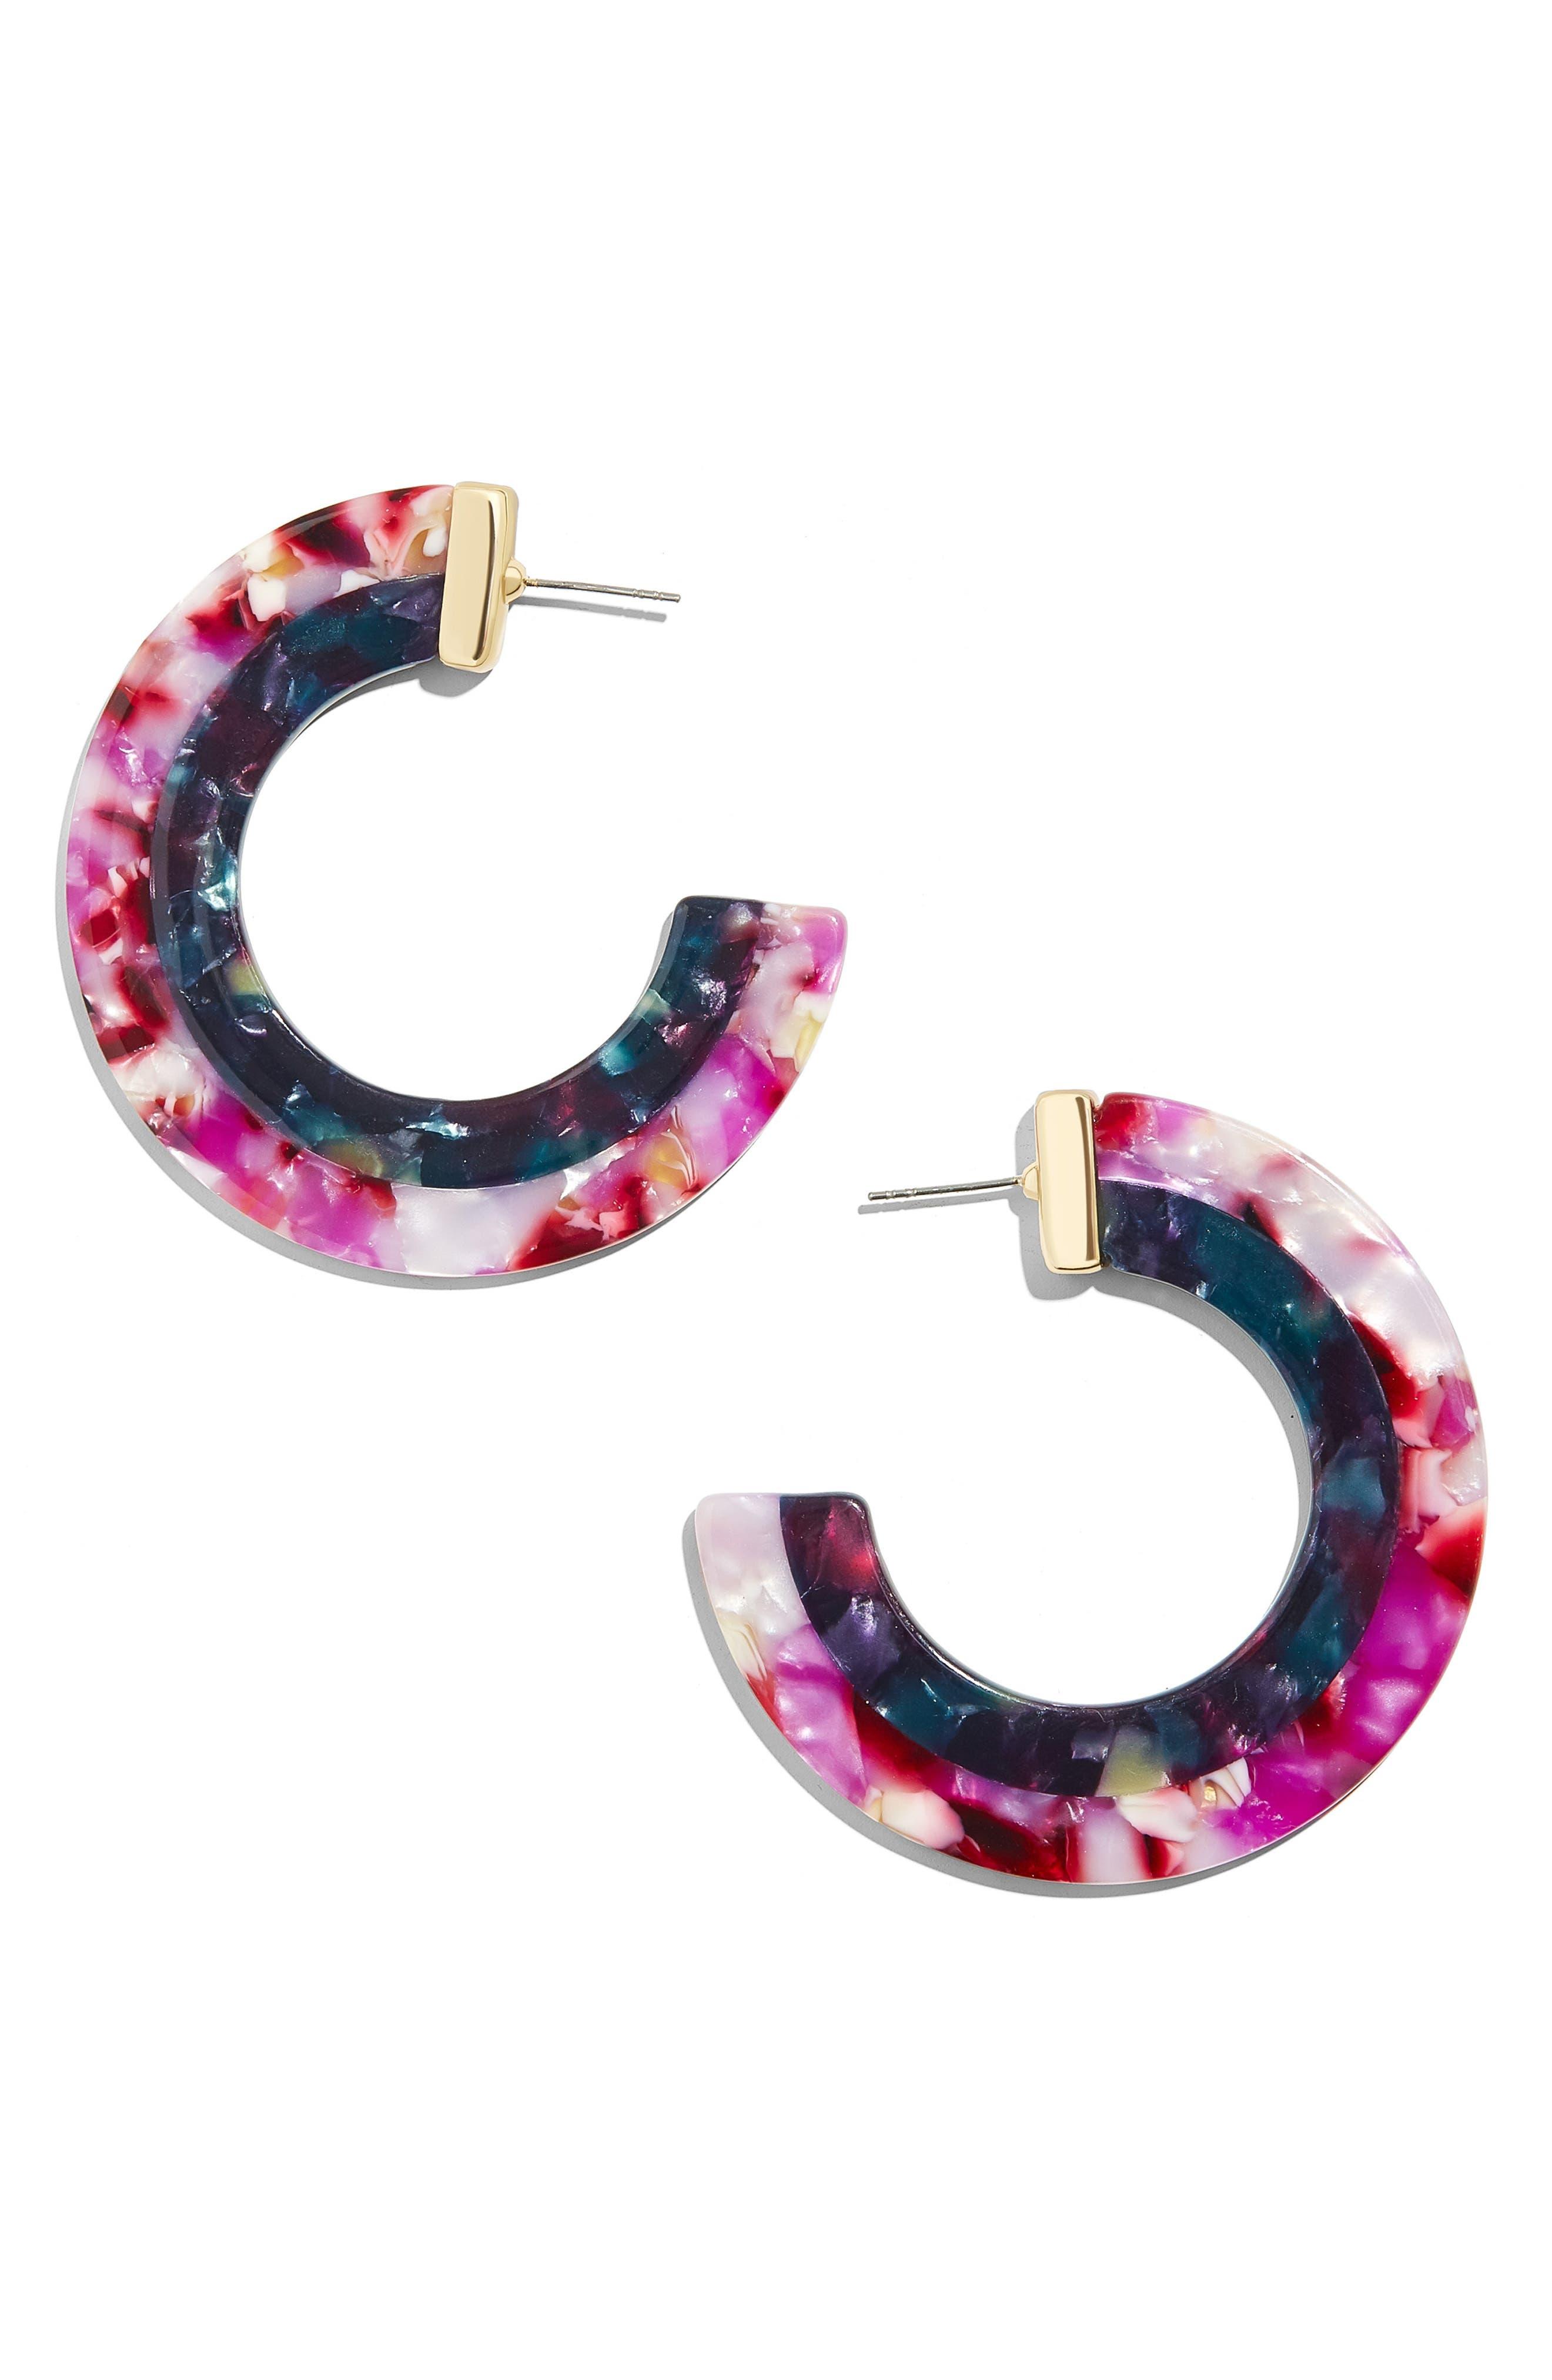 BAUBLEBAR Layered Color Resin Hoop Earrings, Main, color, PINK